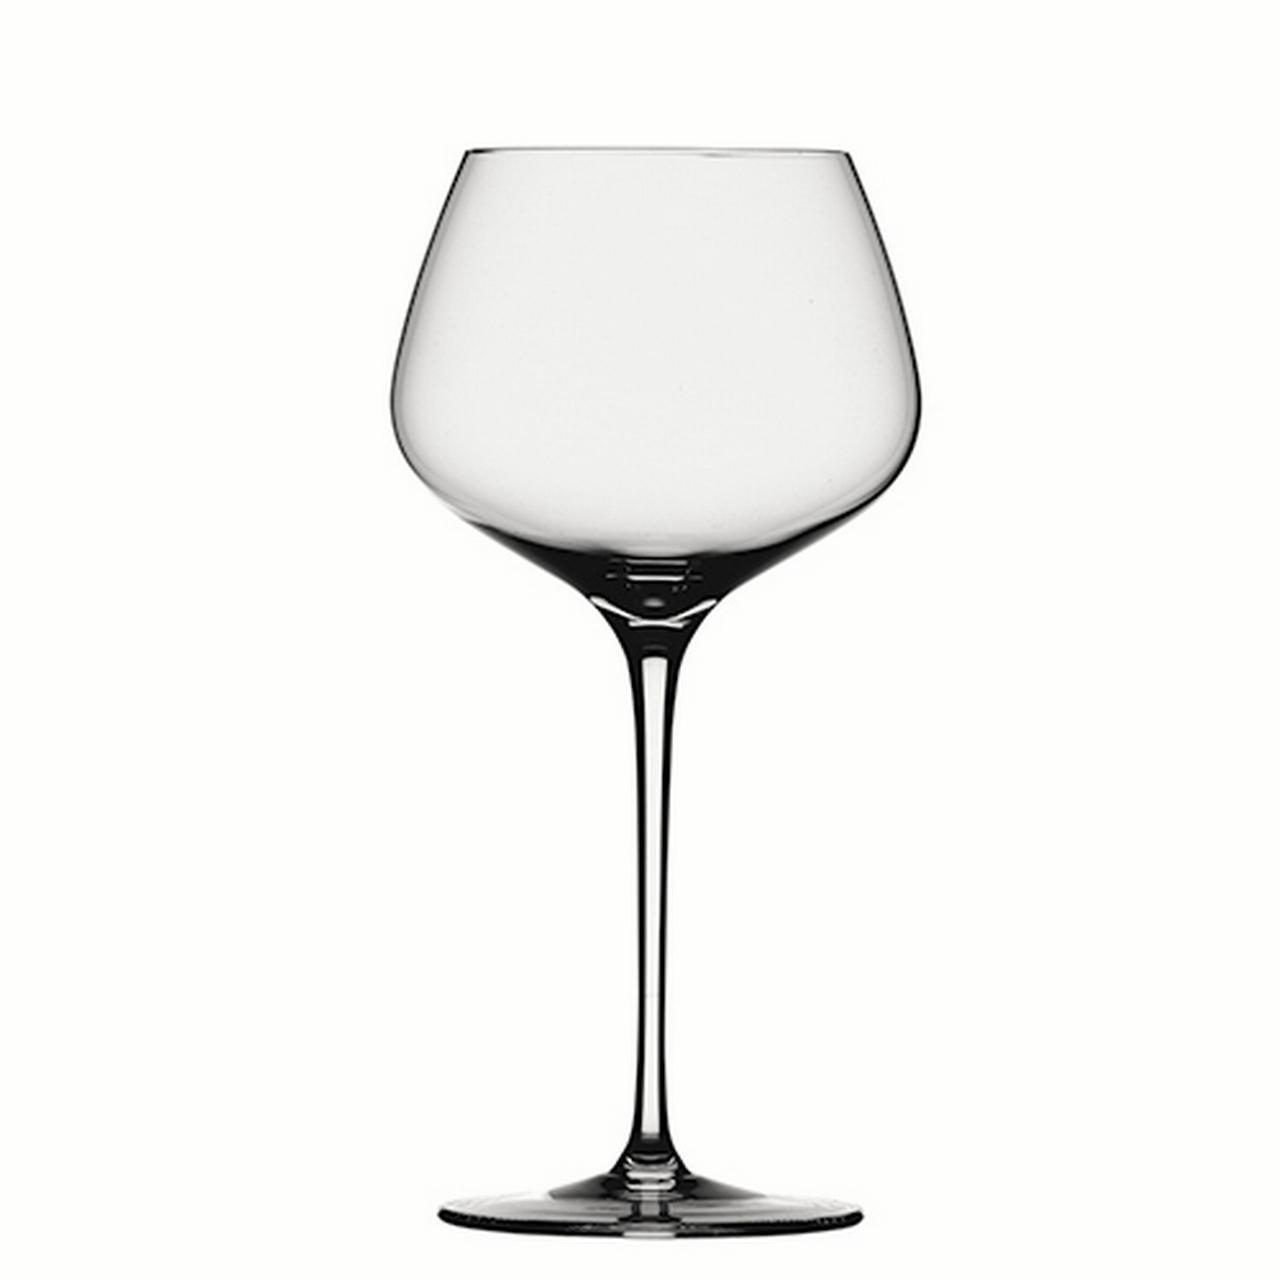 Spiegelau Willsberger 25.6 oz Burgundy Glass (Set of 4) by Spiegelau